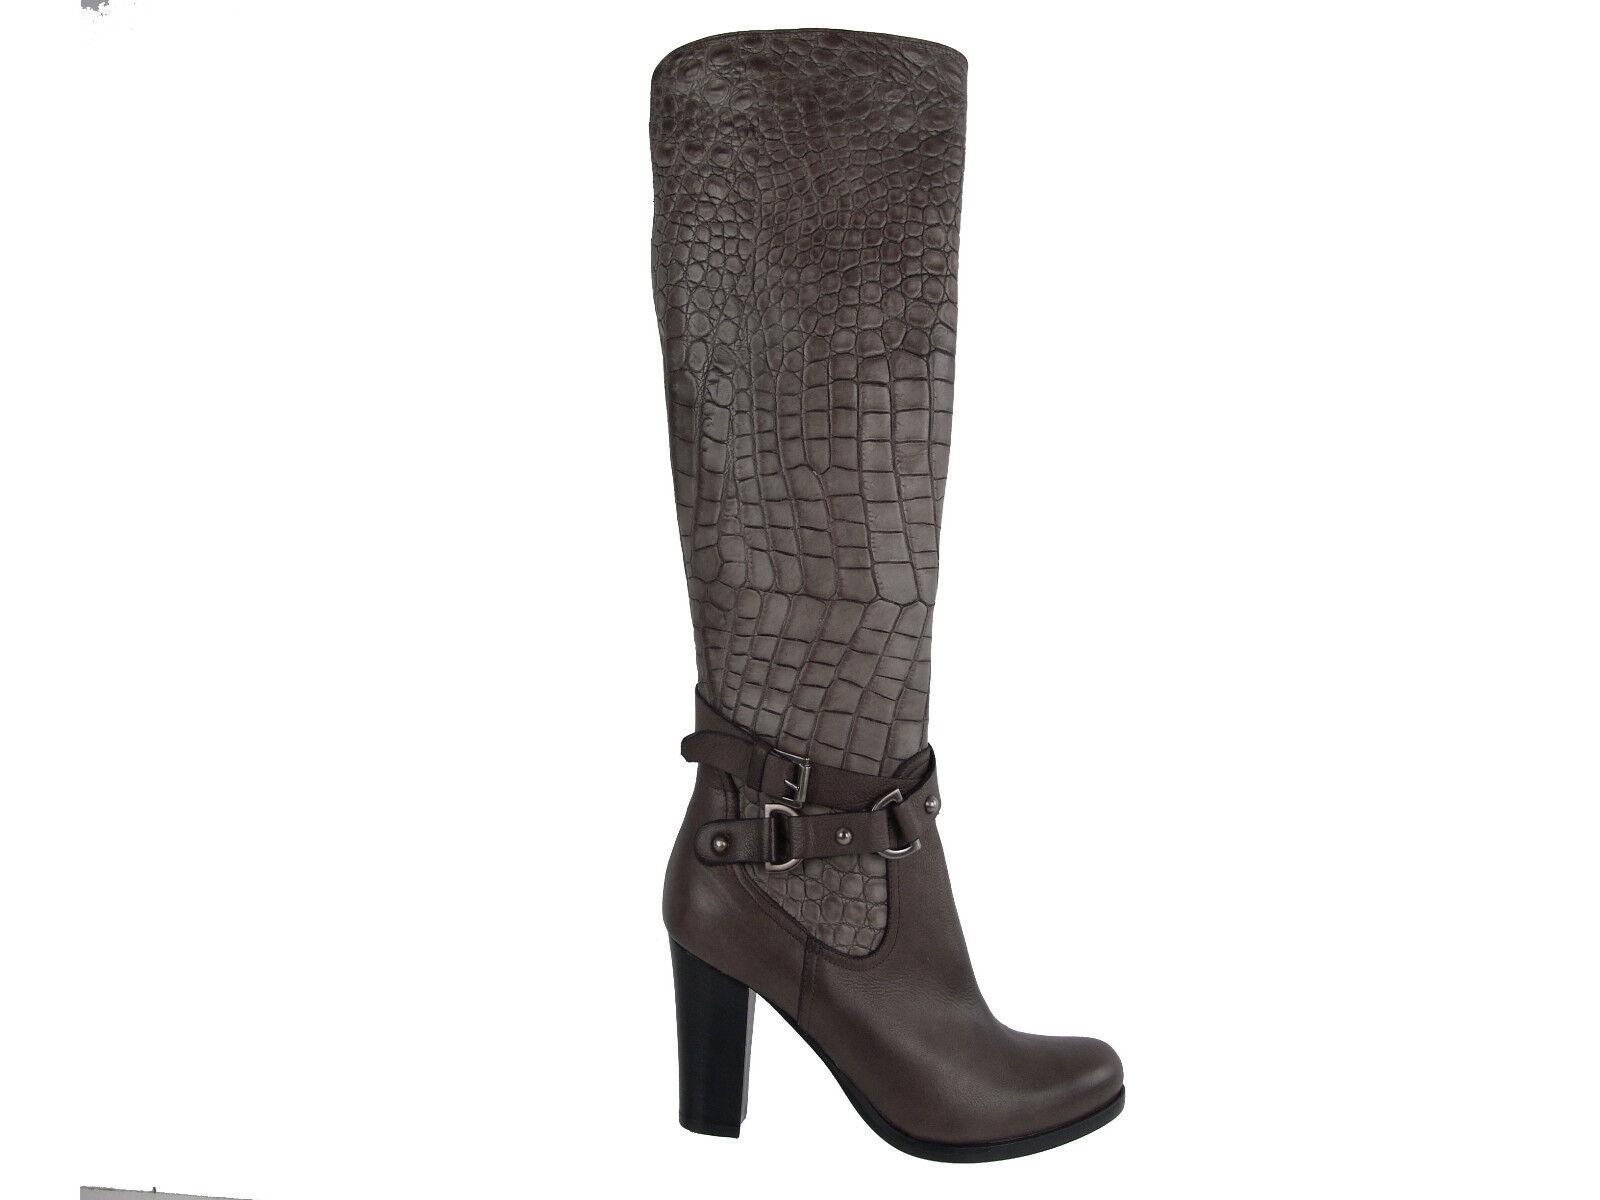 Napoleoni Italian Fashion Croco Boots EU 36 Womens shoes Heels